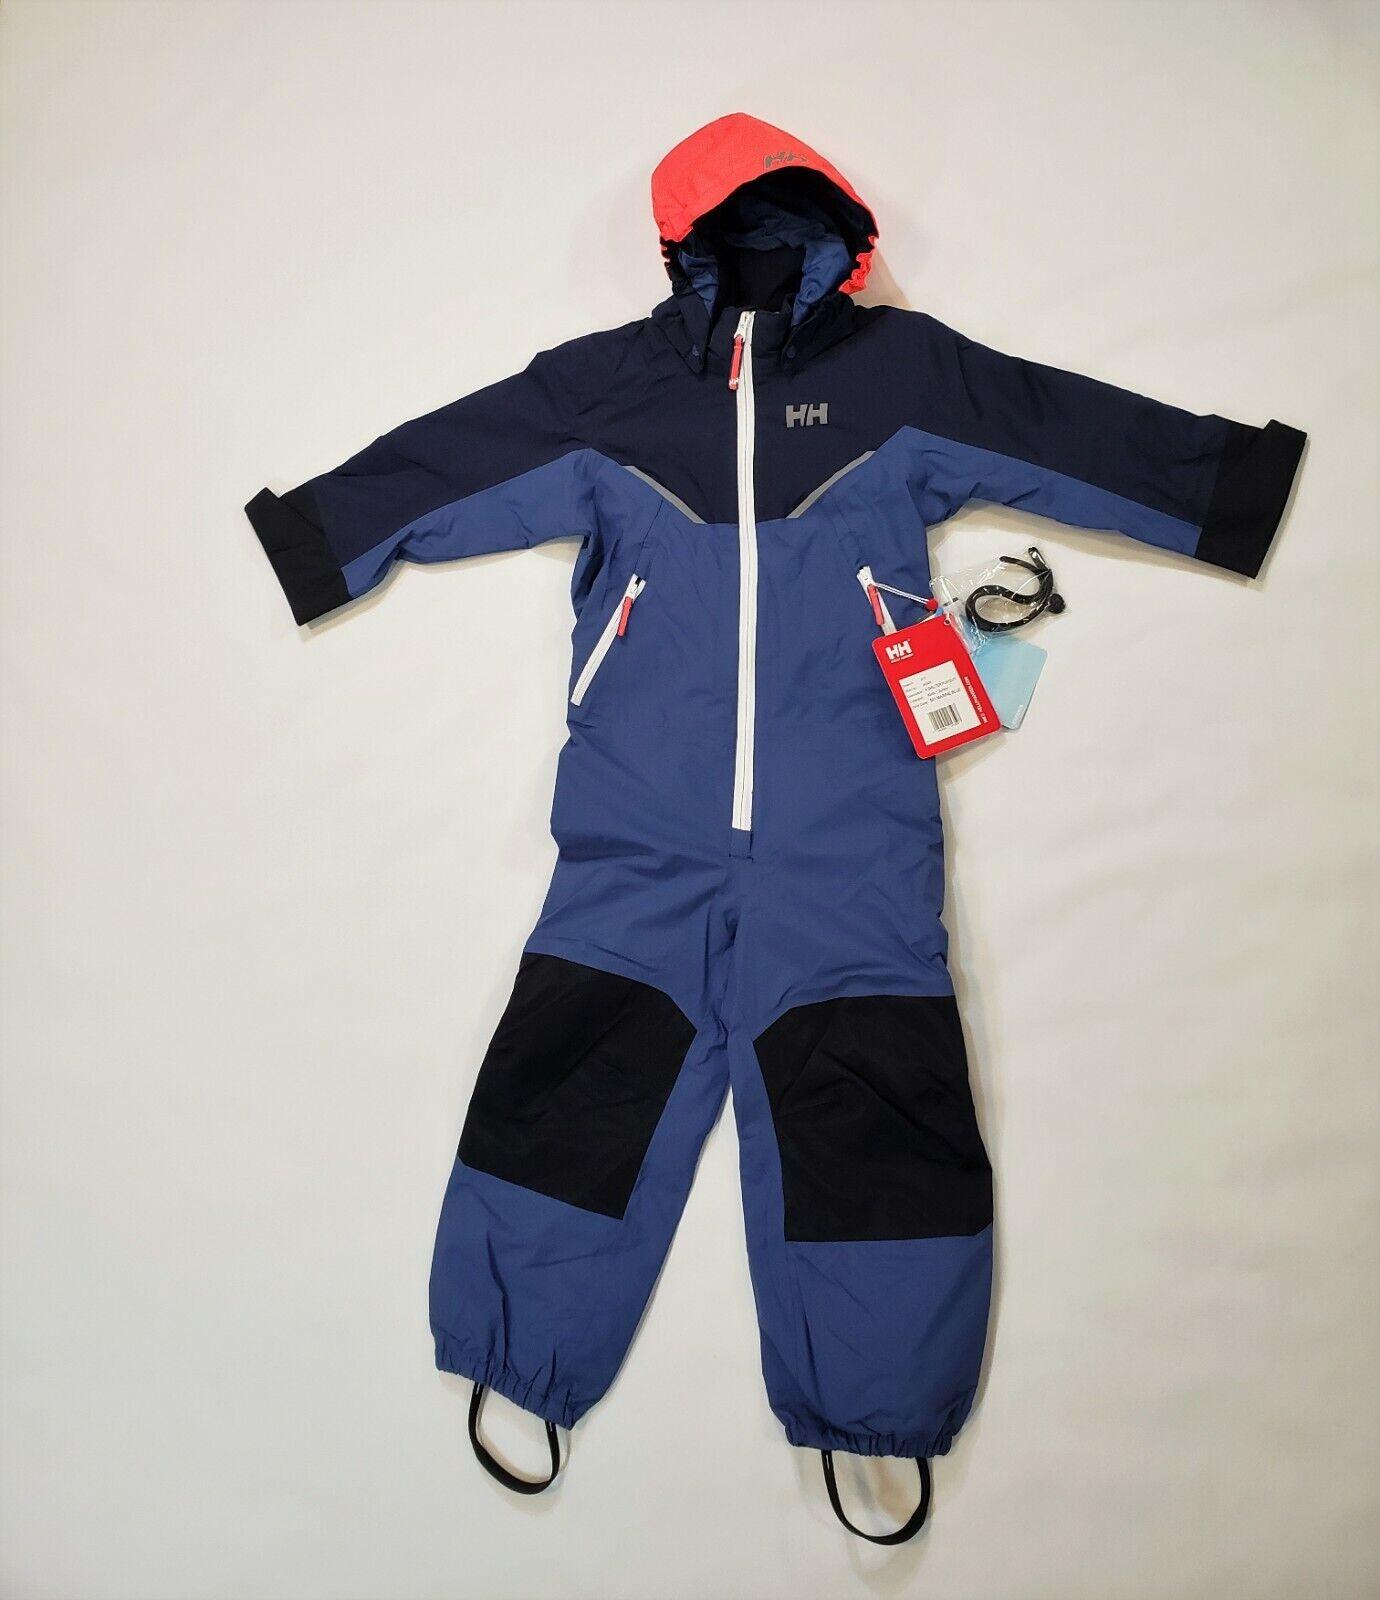 Helly Hansen Kids Snowsuit Shelter Playsuit Size 4T -  5